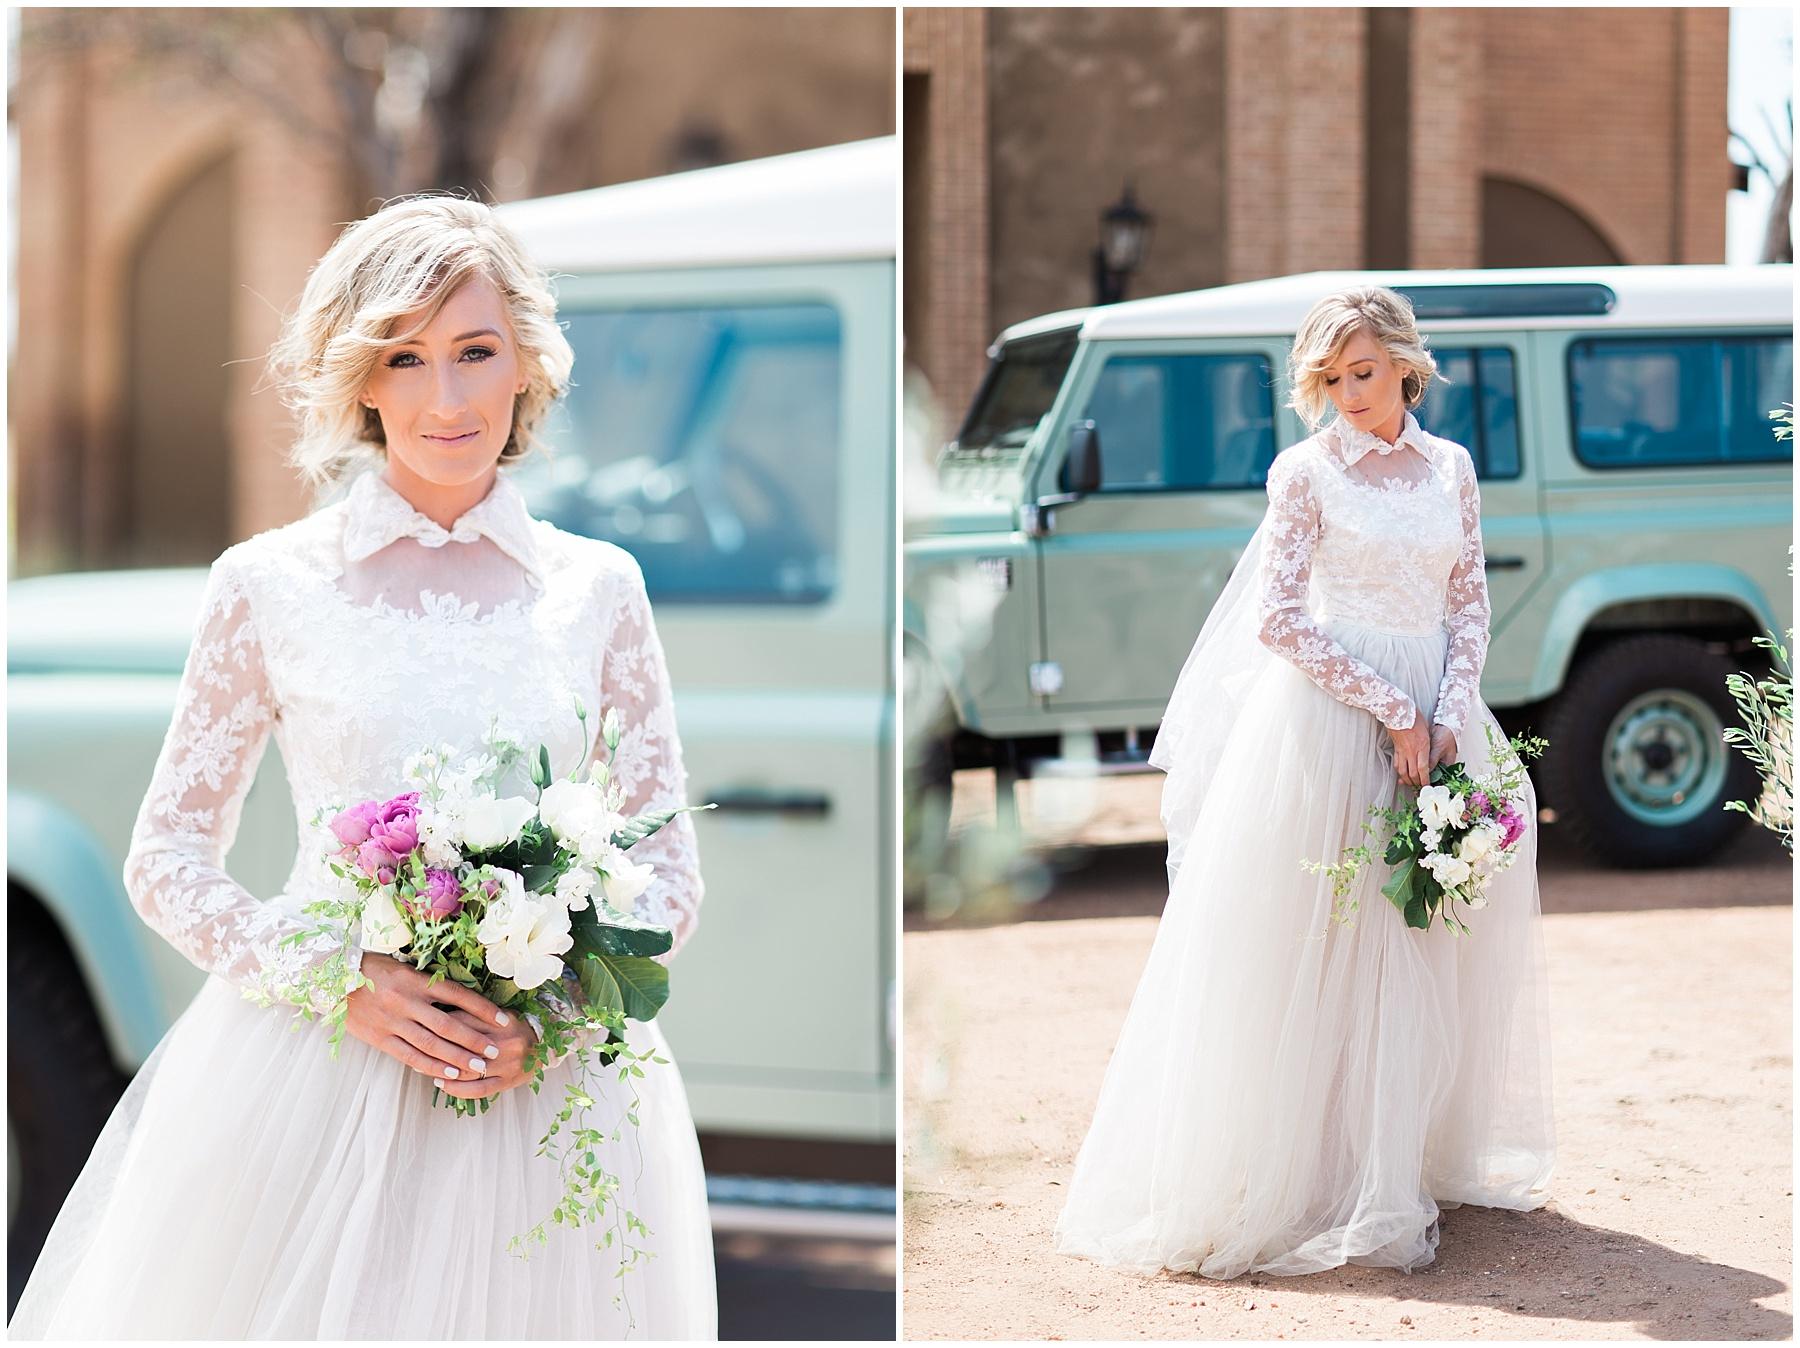 AliciaLandman_JoleneandZander_Wedding_The Pretty Blog_0426.jpg